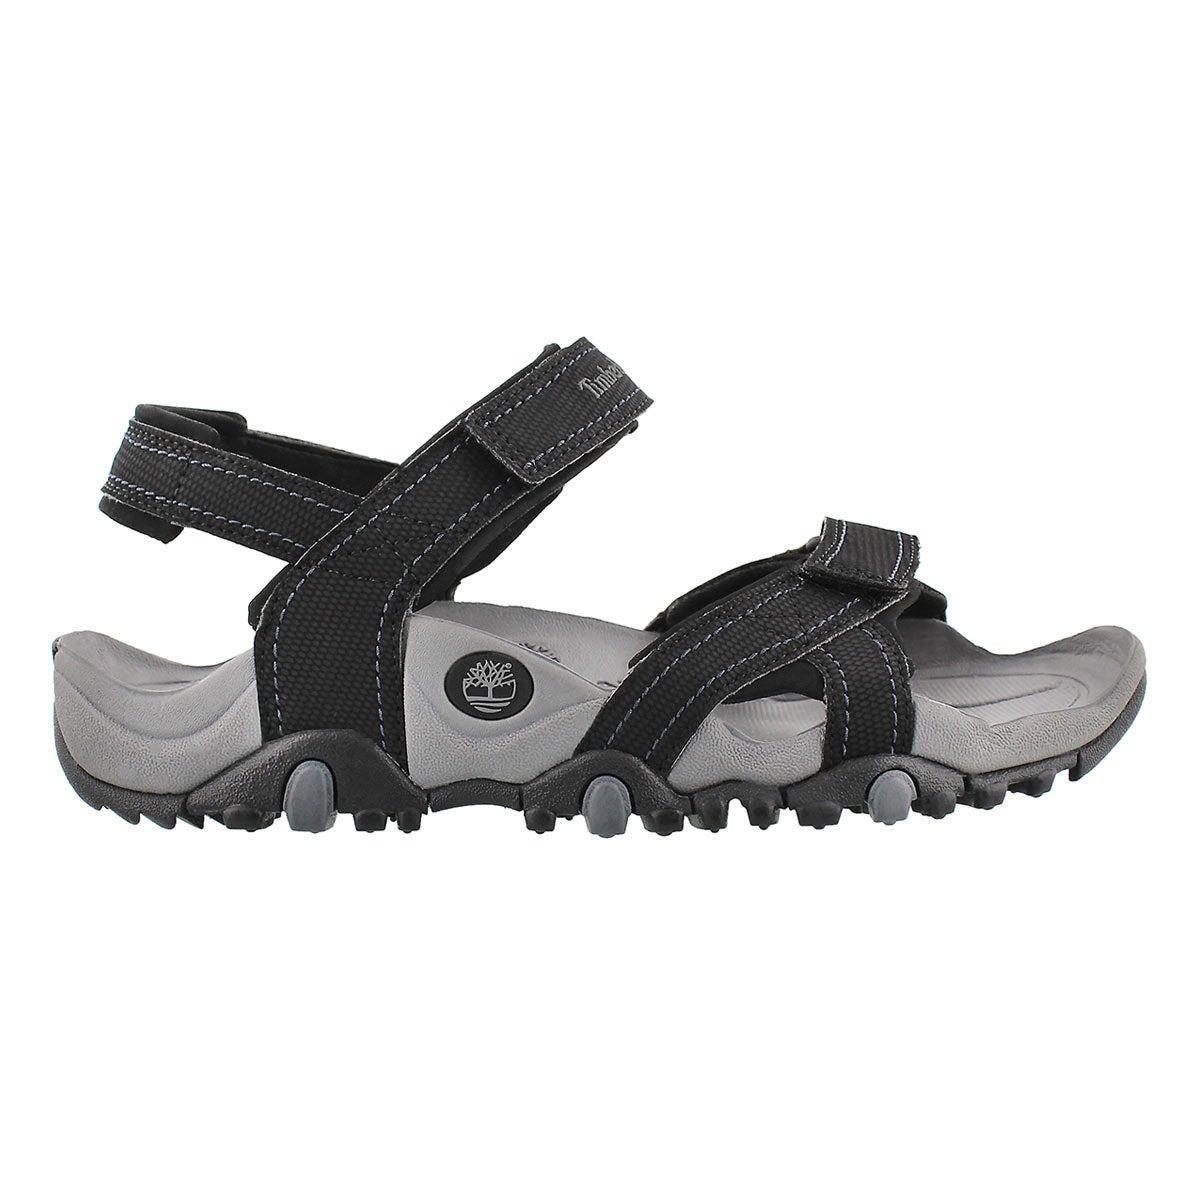 Mns N Granite Trailray blk sport sandal